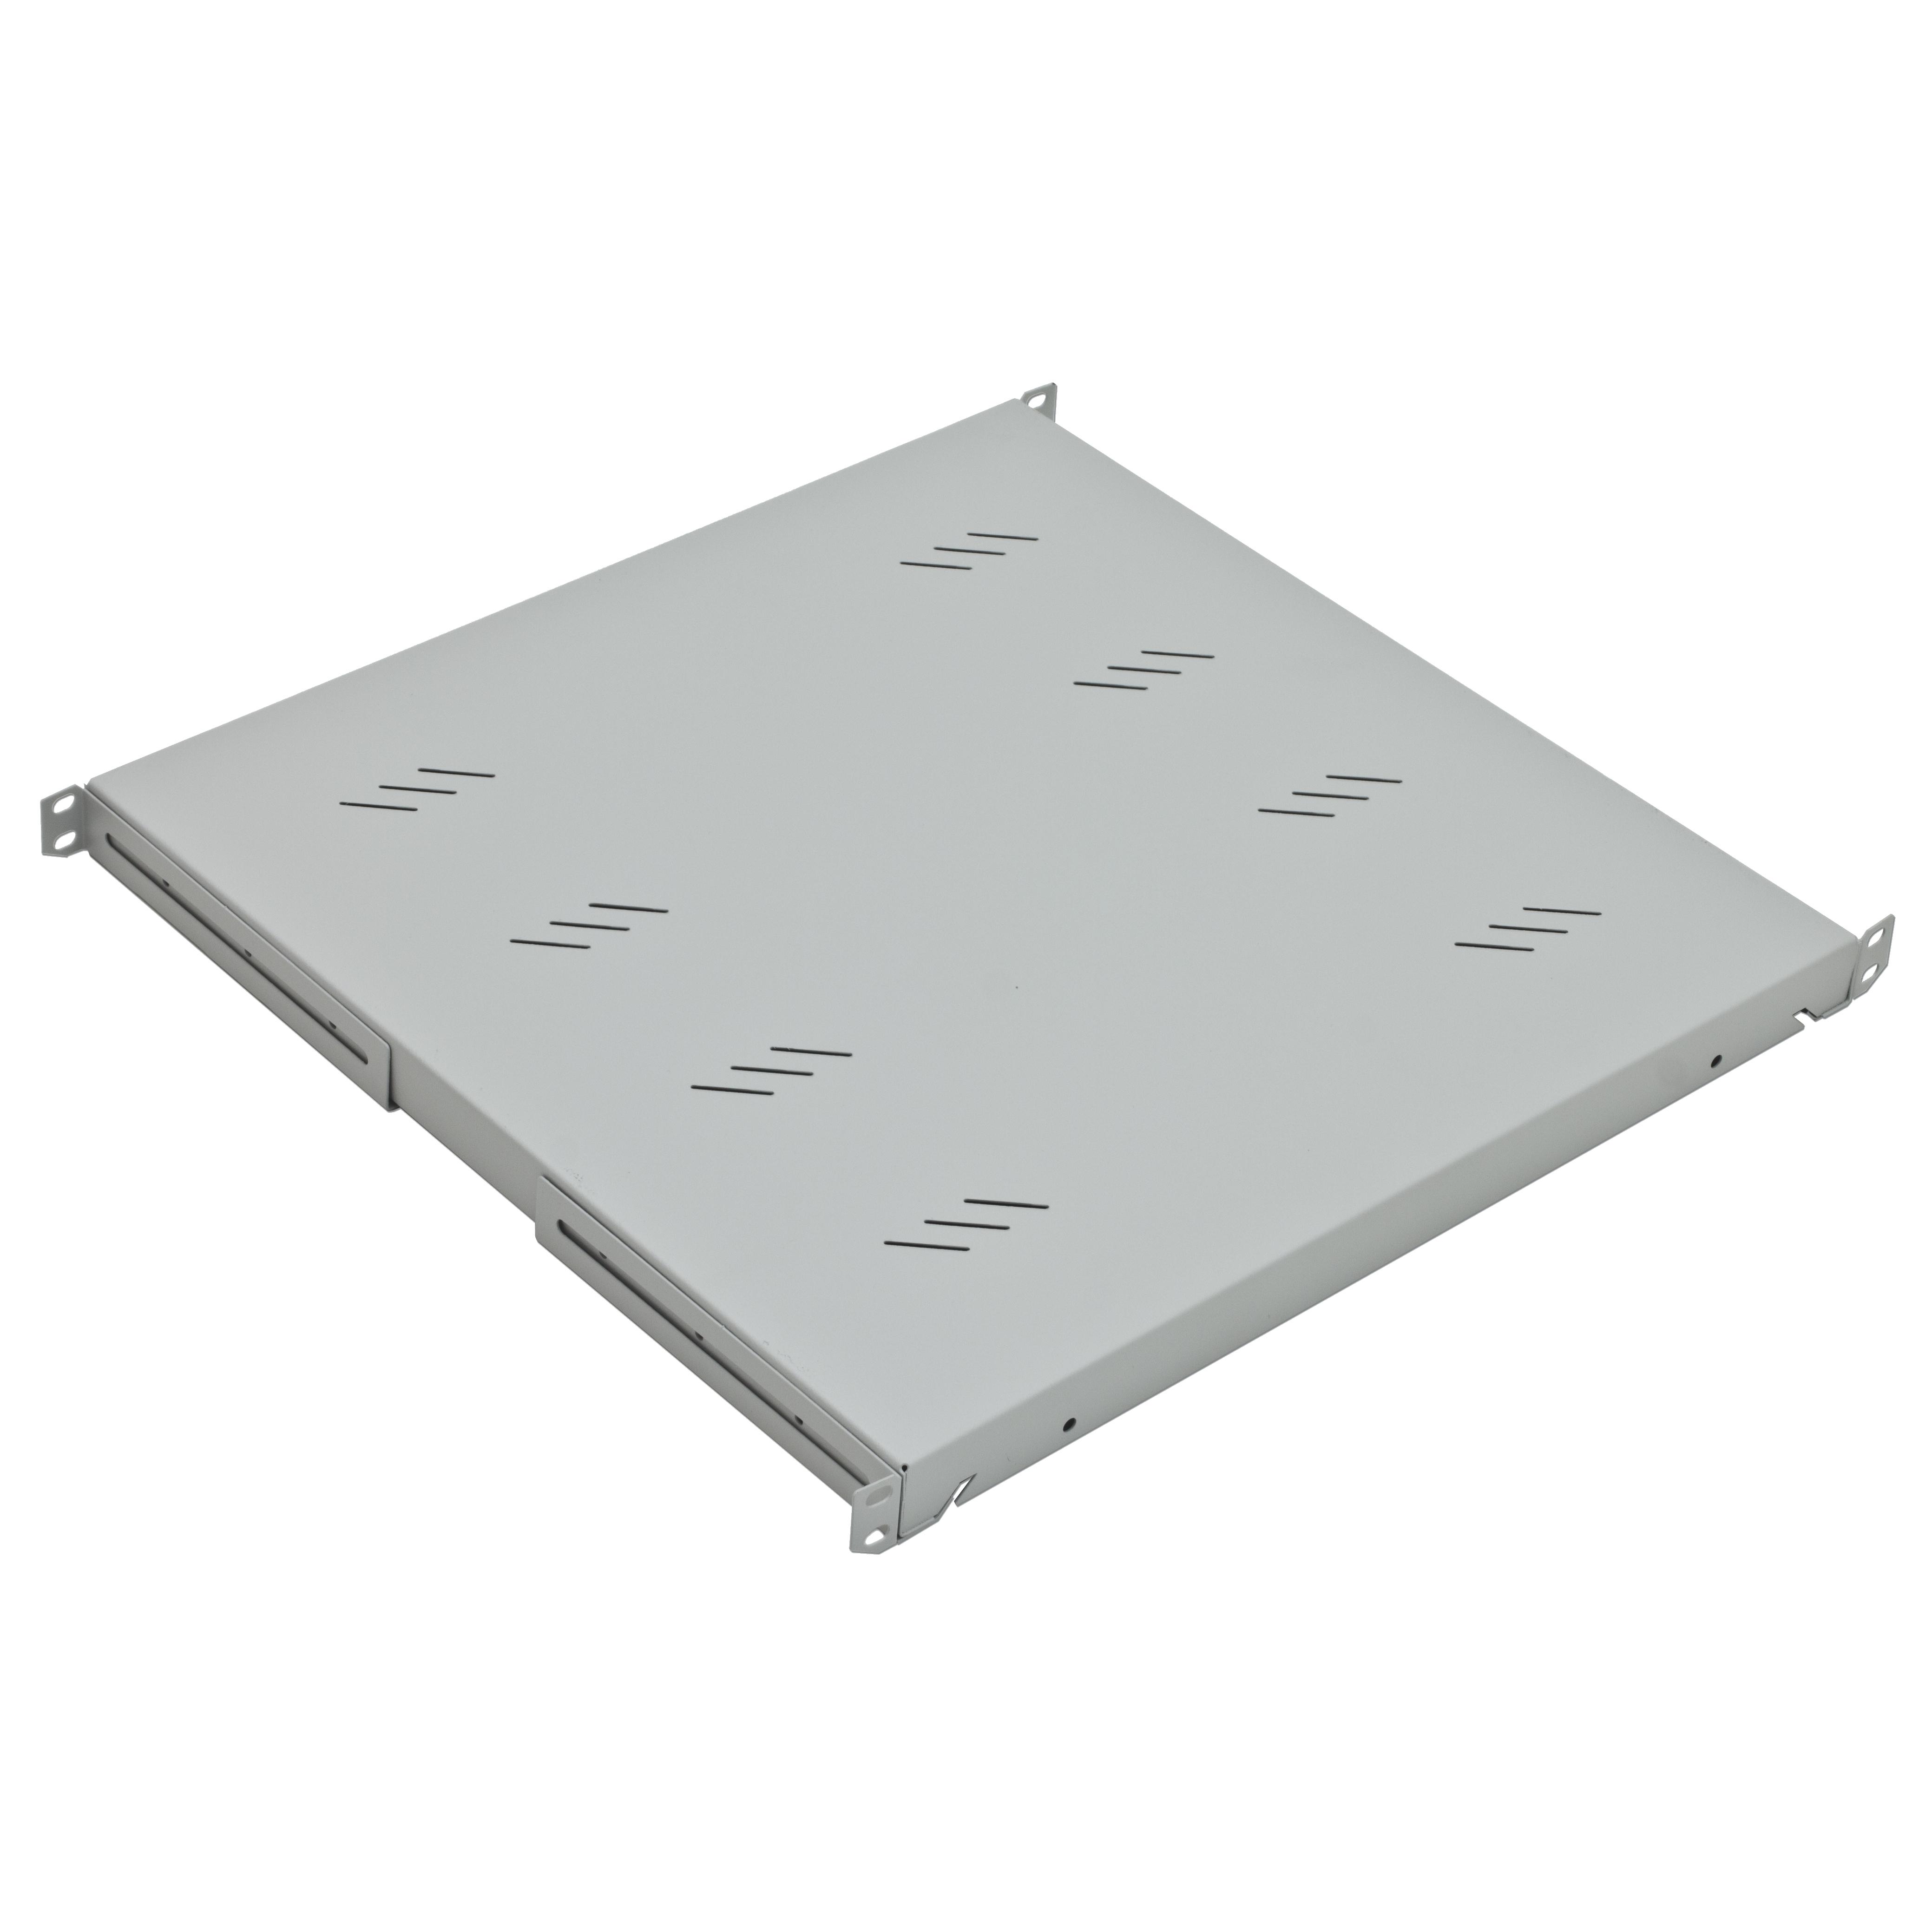 1 Stk 19 Fachboden Fix, bis 80kg Last, T=450mm, 1HE, RAL7035 DFS14845-C